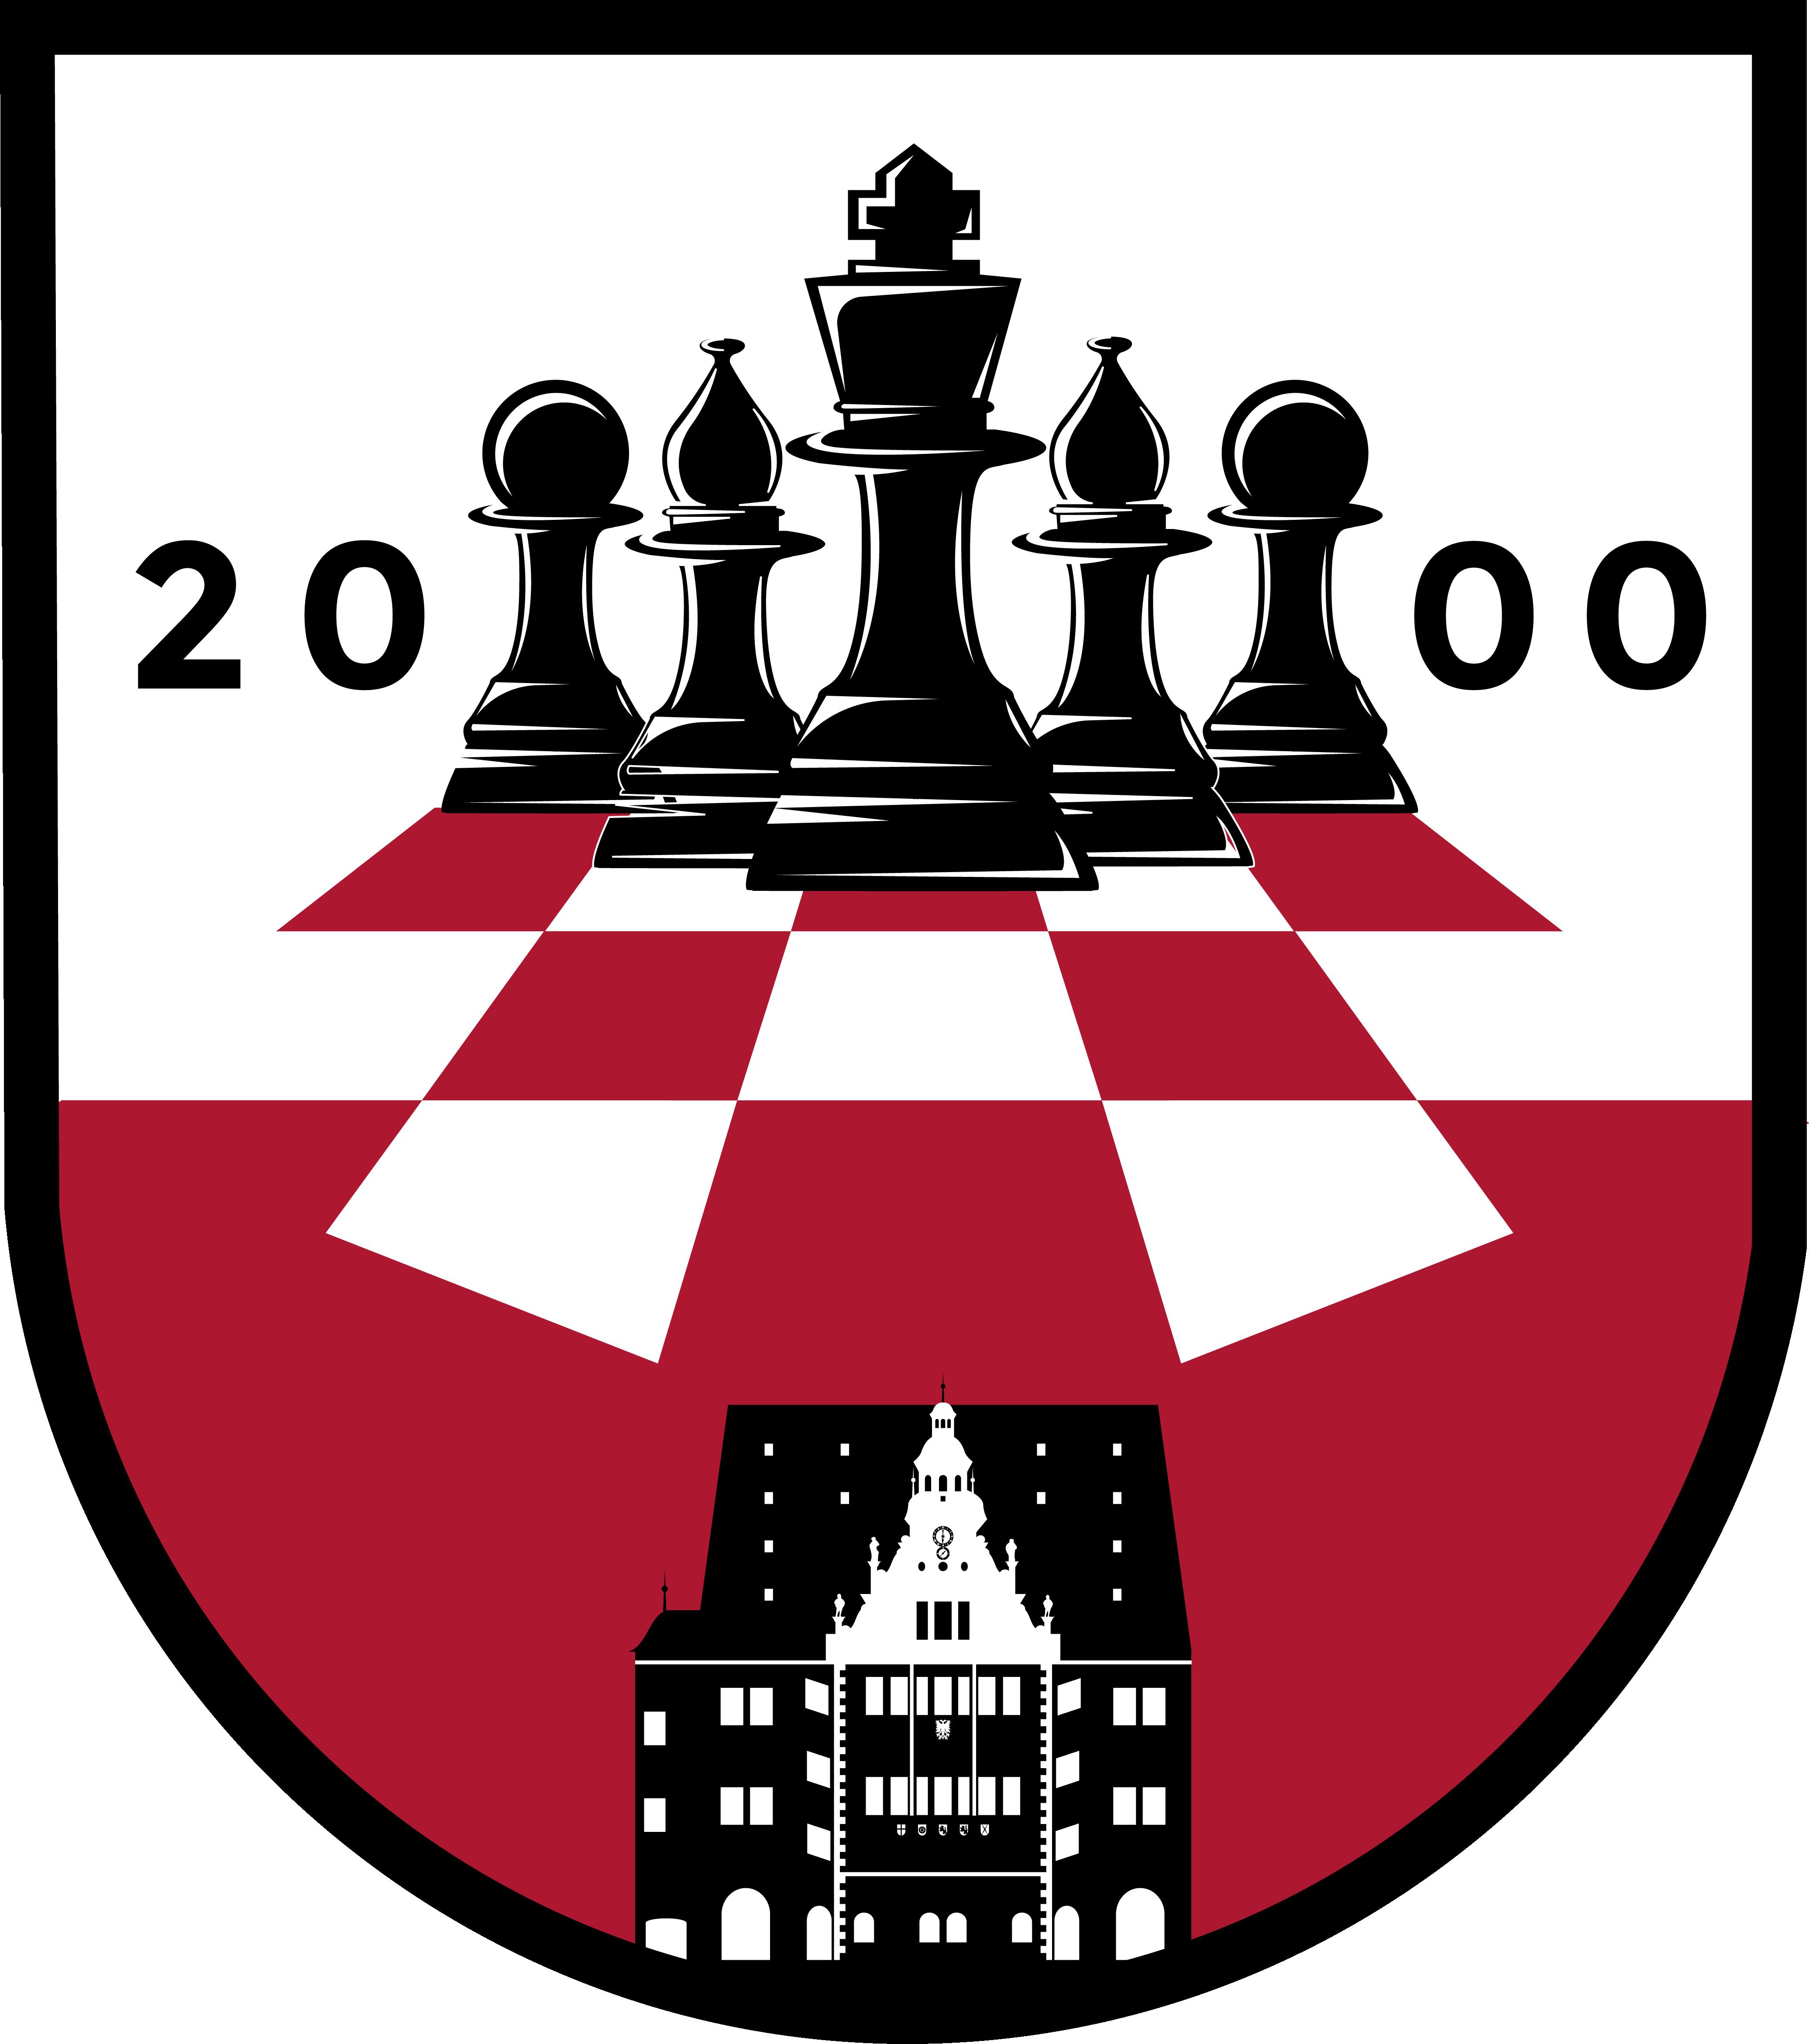 SKSW2000 Logo